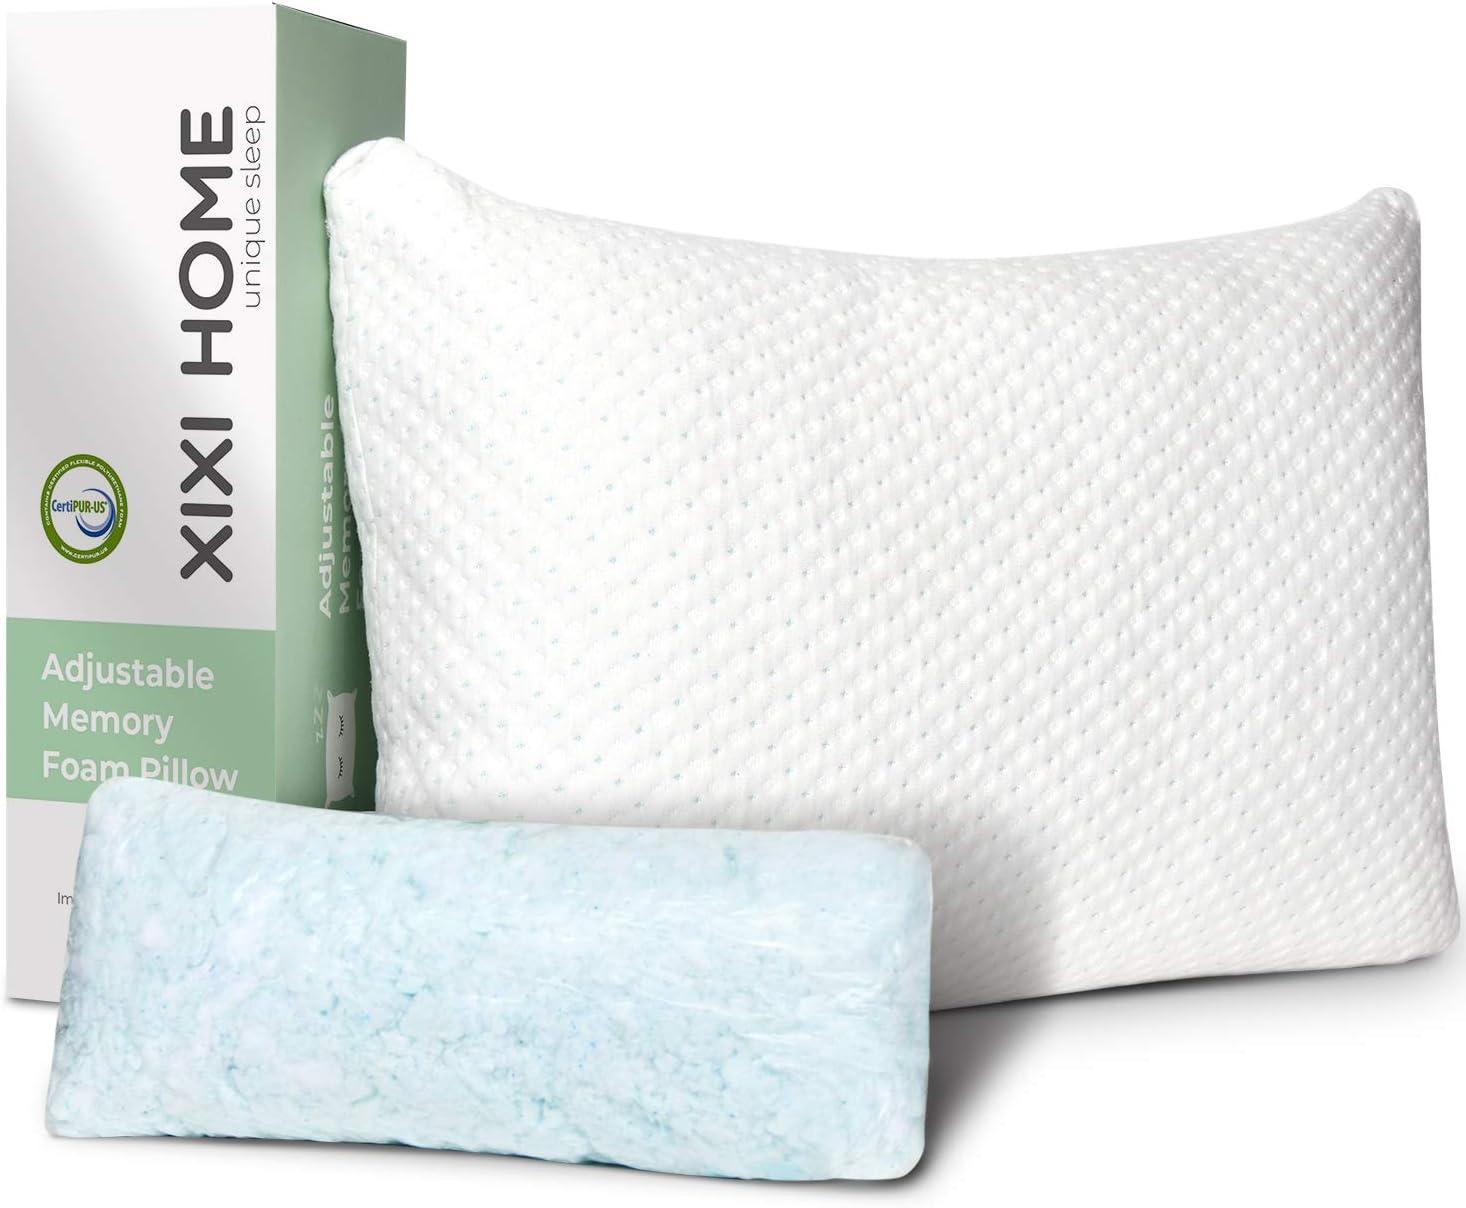 Memory pillows cover